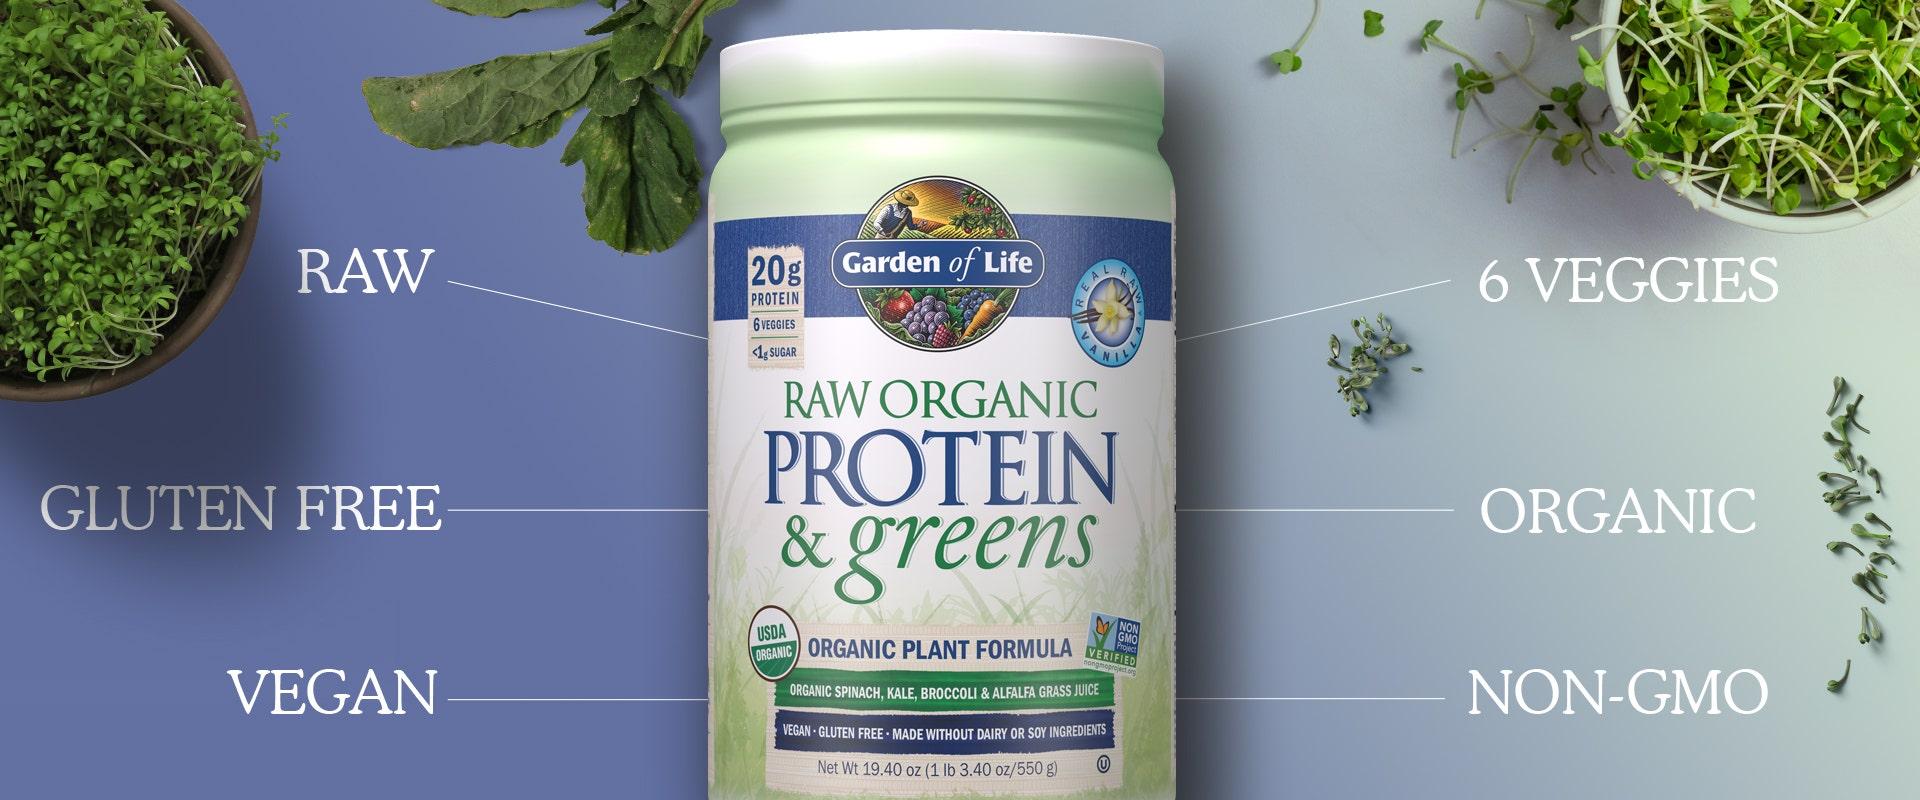 Raw Organic Protein and Greens Powder